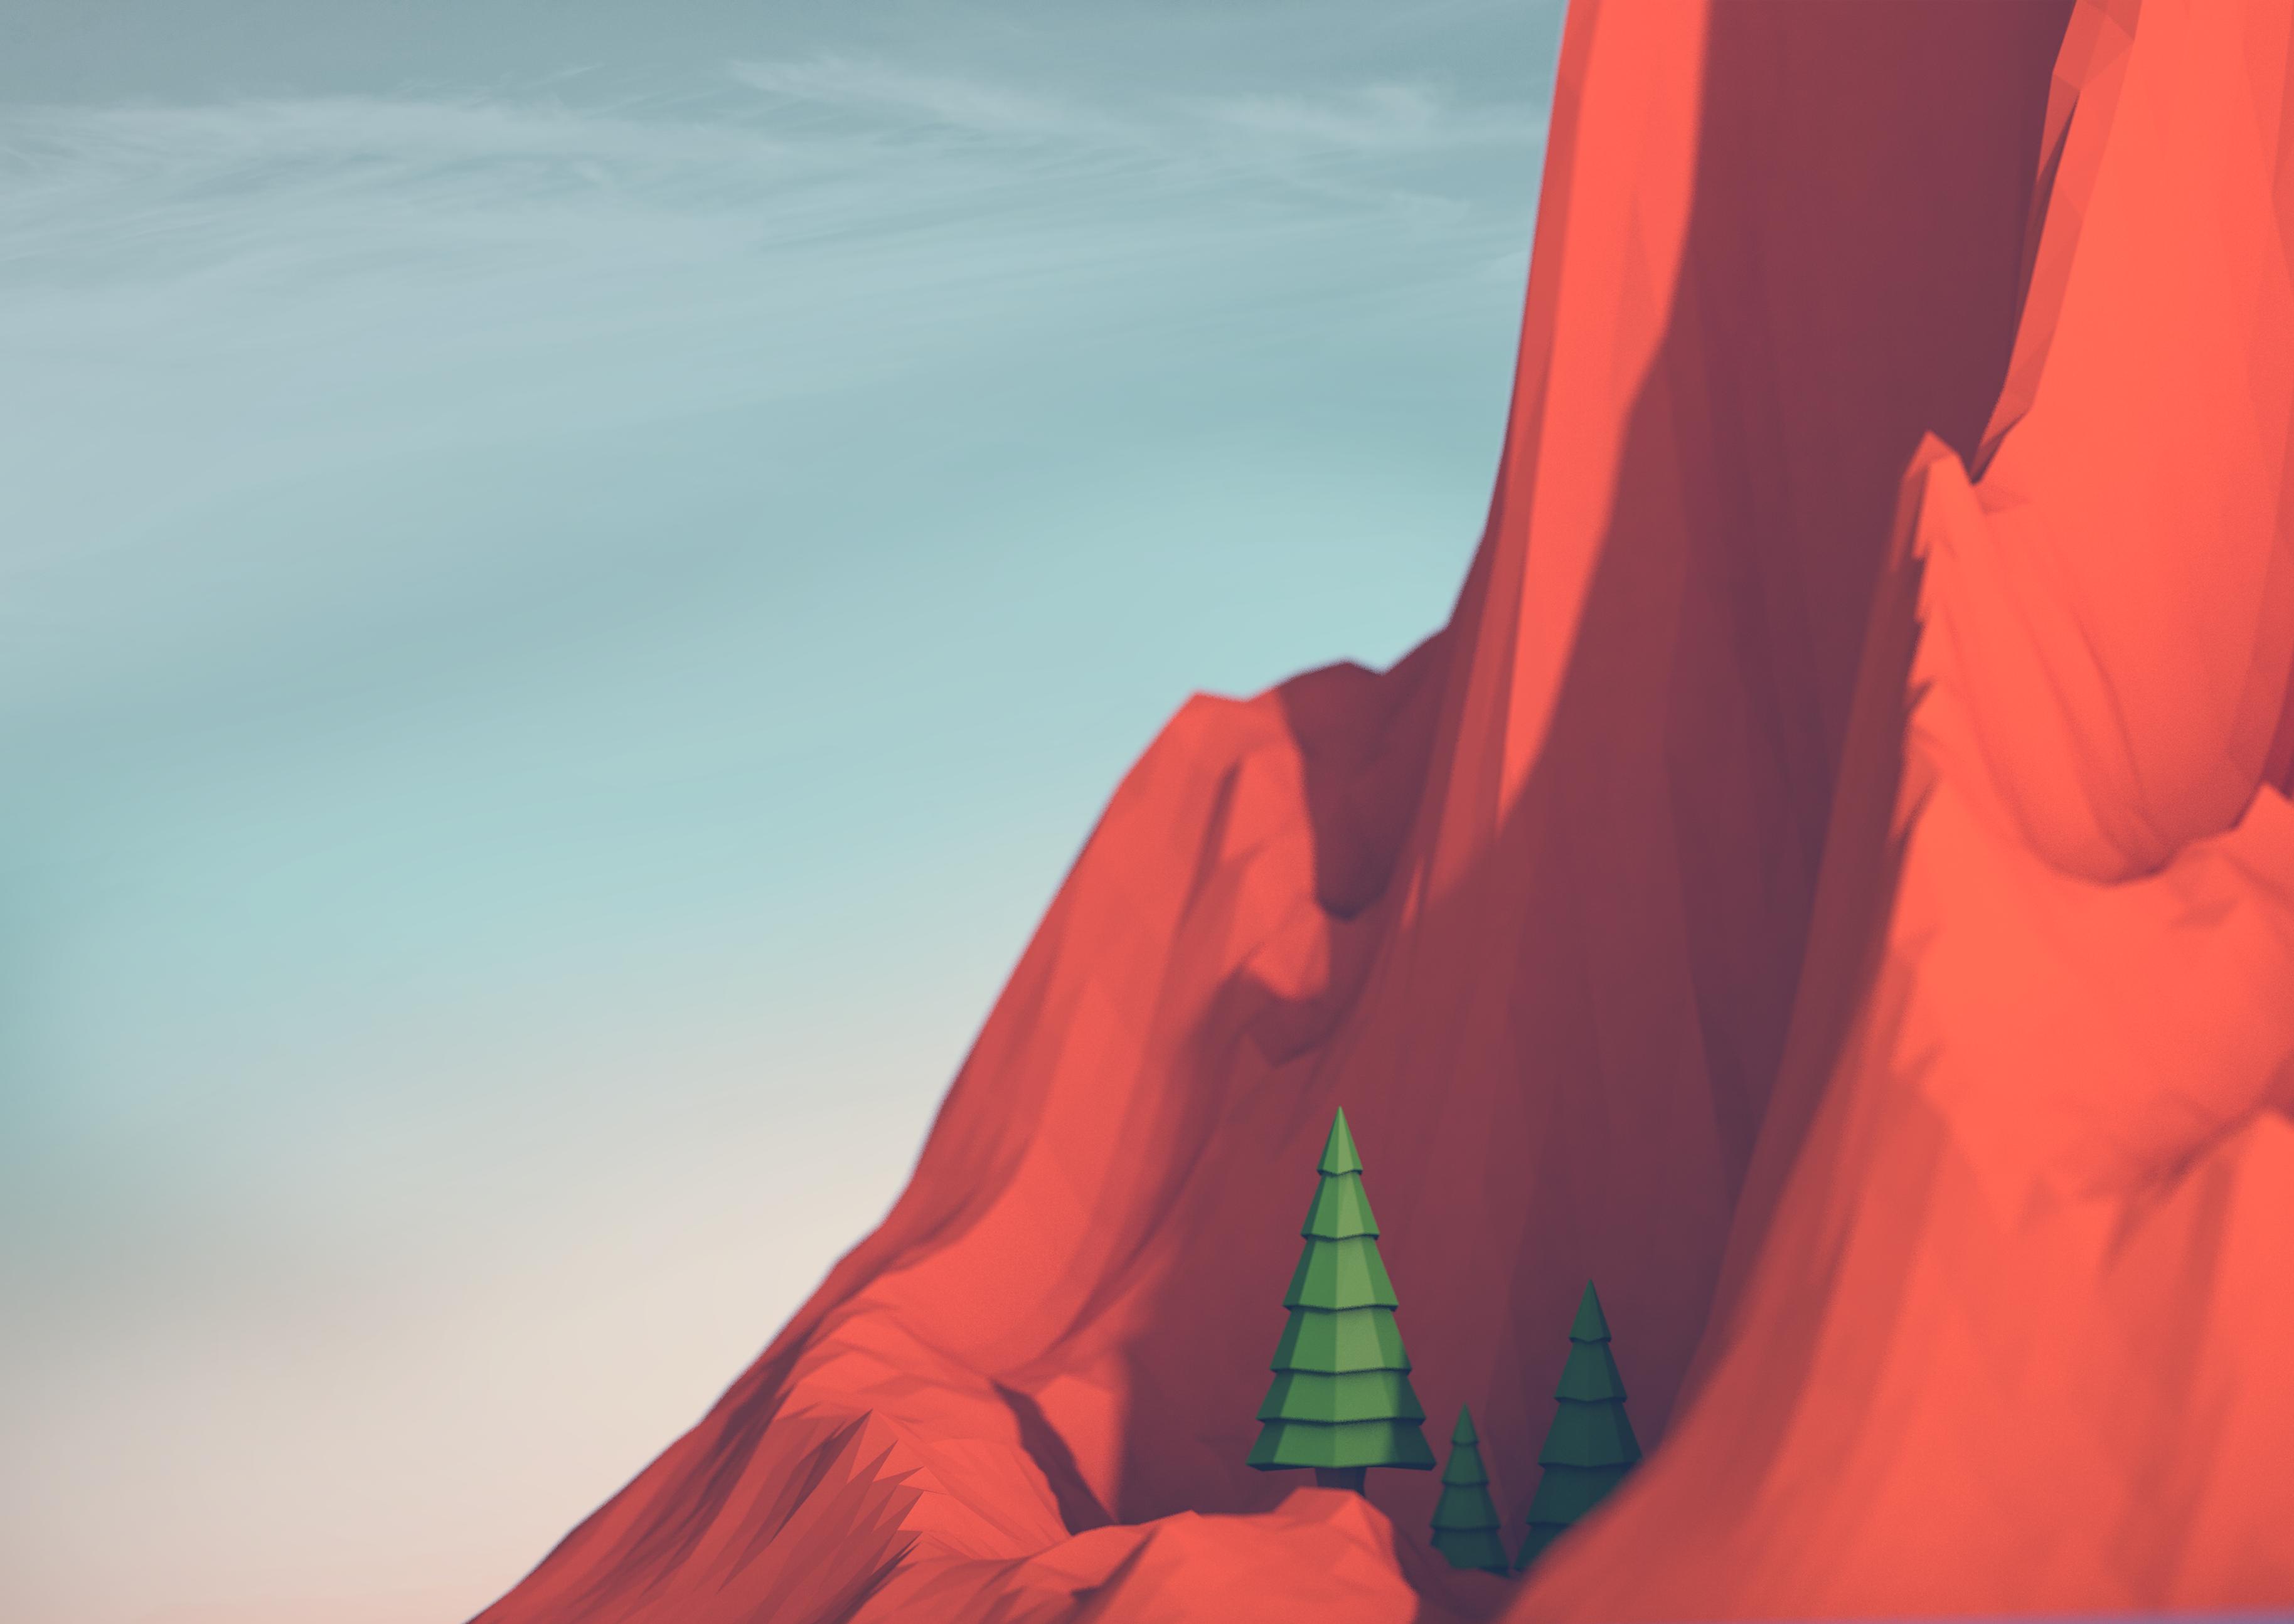 Must see Wallpaper Mountain Polygon - low-poly-3D-mountains-polygon-art-1250285  Pic_877796.jpg